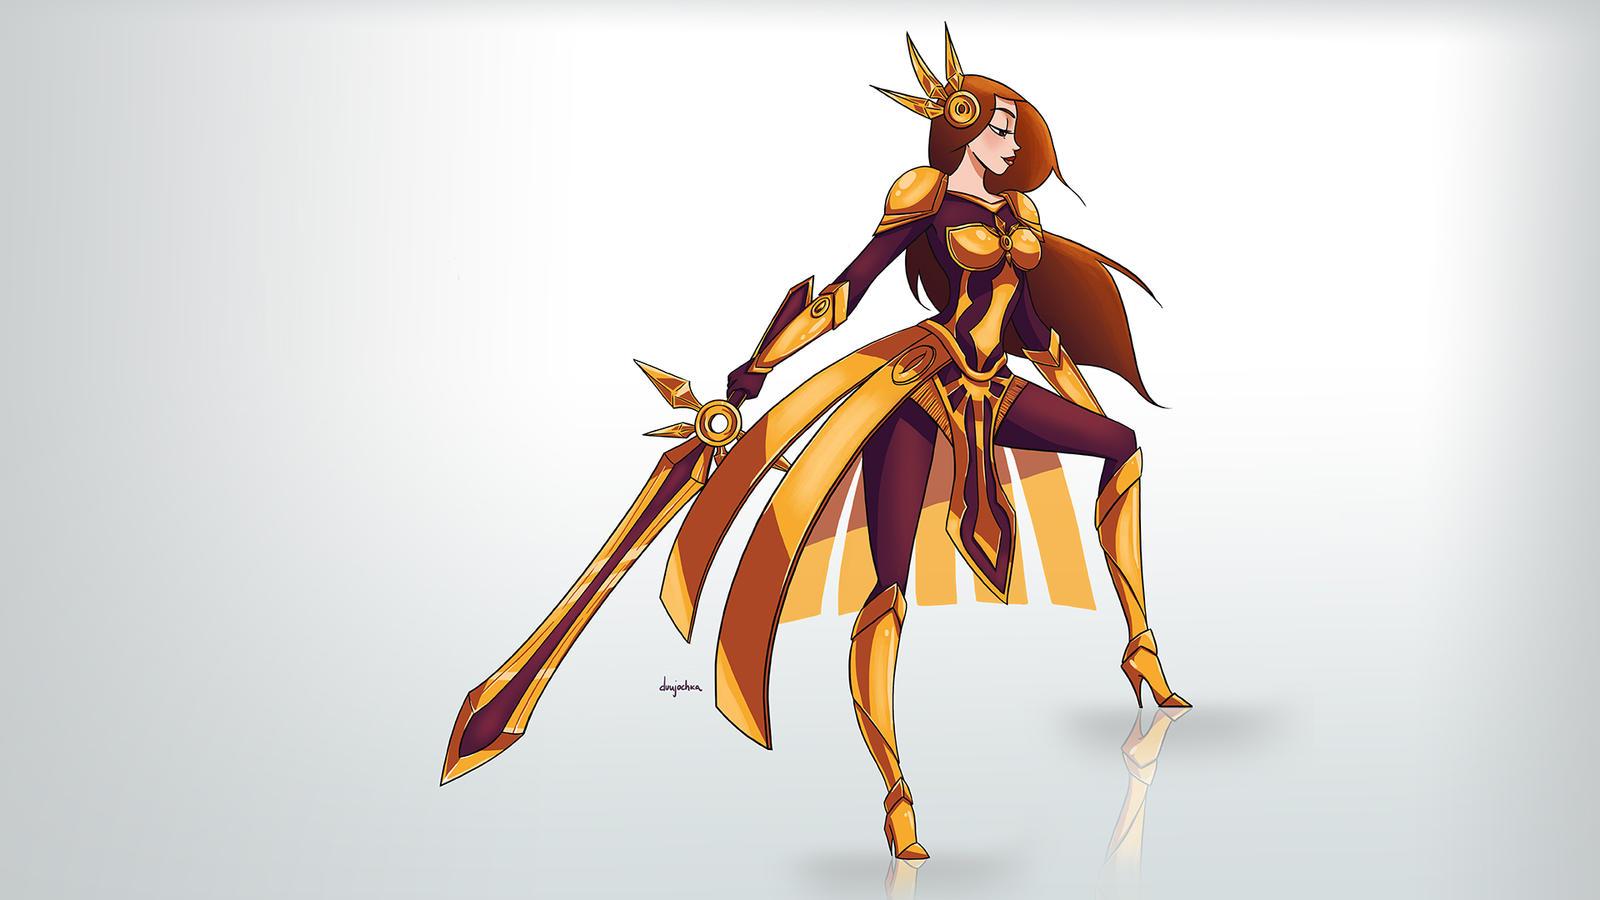 League Of Legends Leona Hot | www.pixshark.com - Images ...